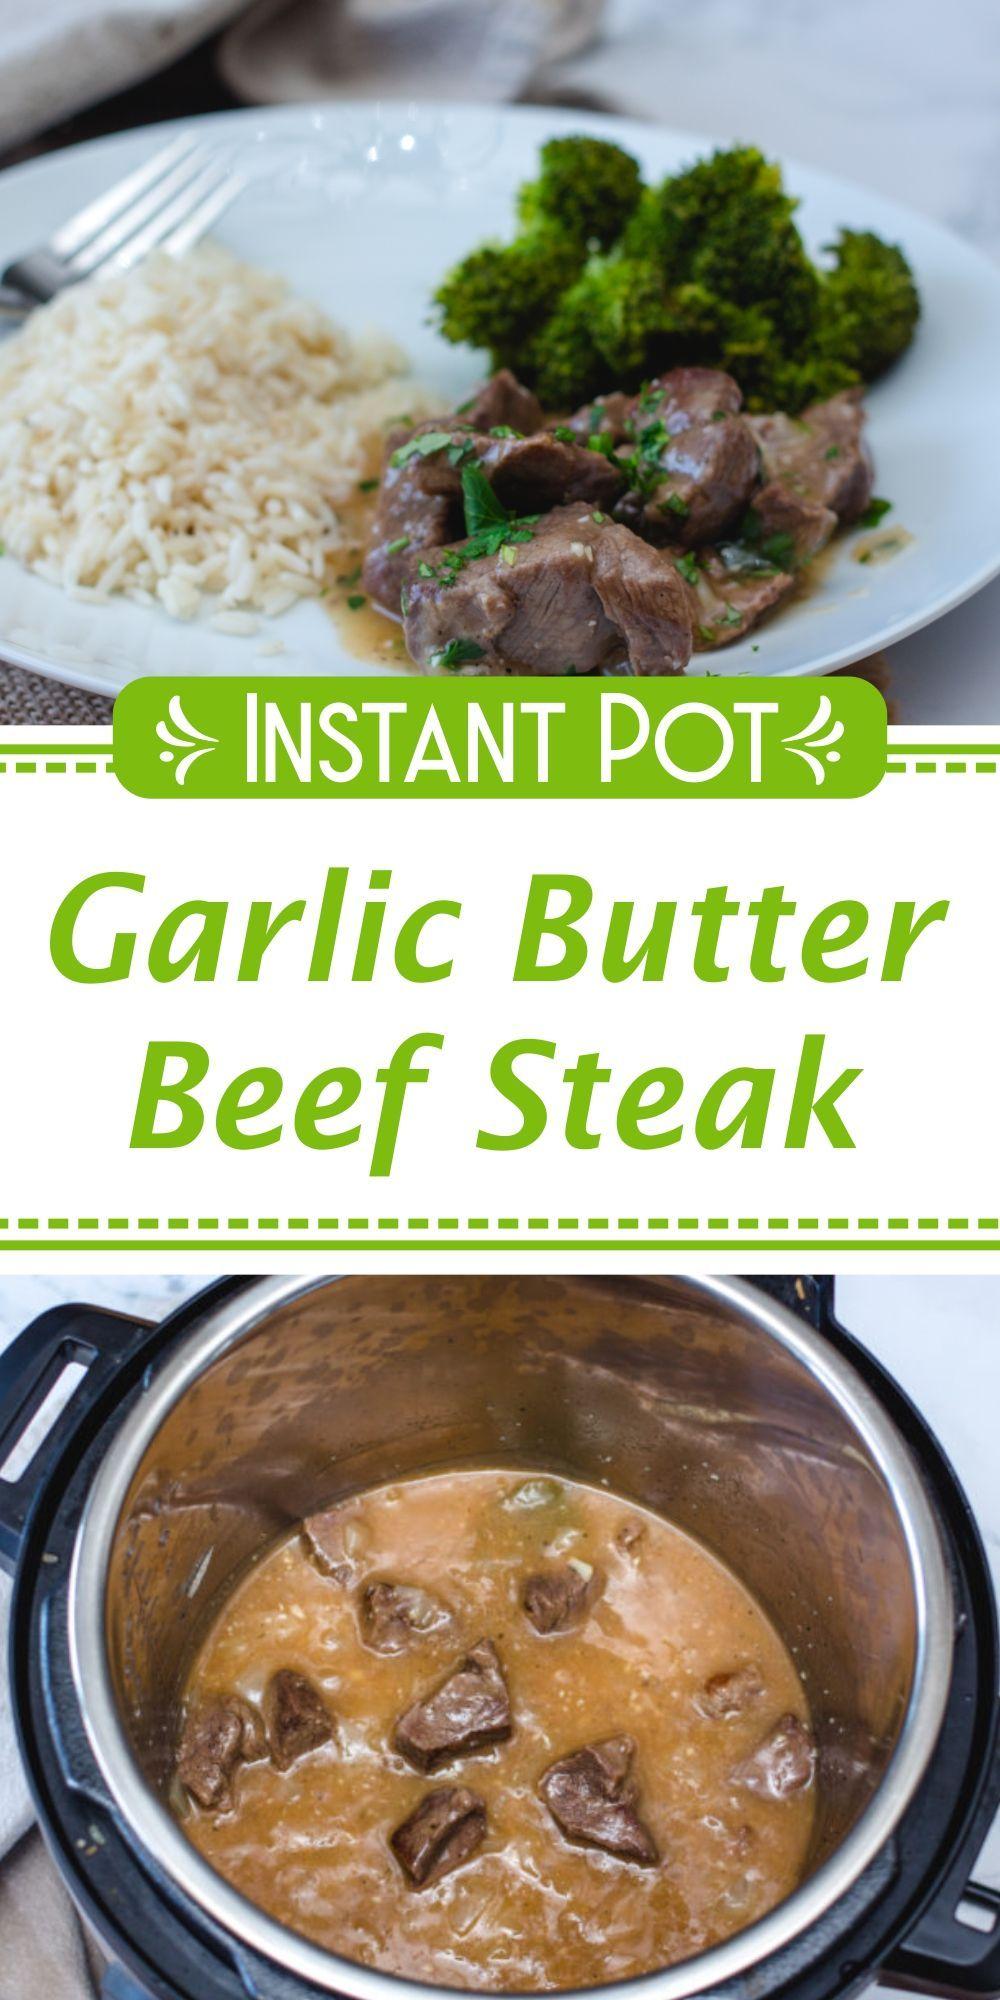 Instant Pot Beef Steak Recipe Sirloin Steak Recipes Top Sirloin Steak Recipe Beef Recipes